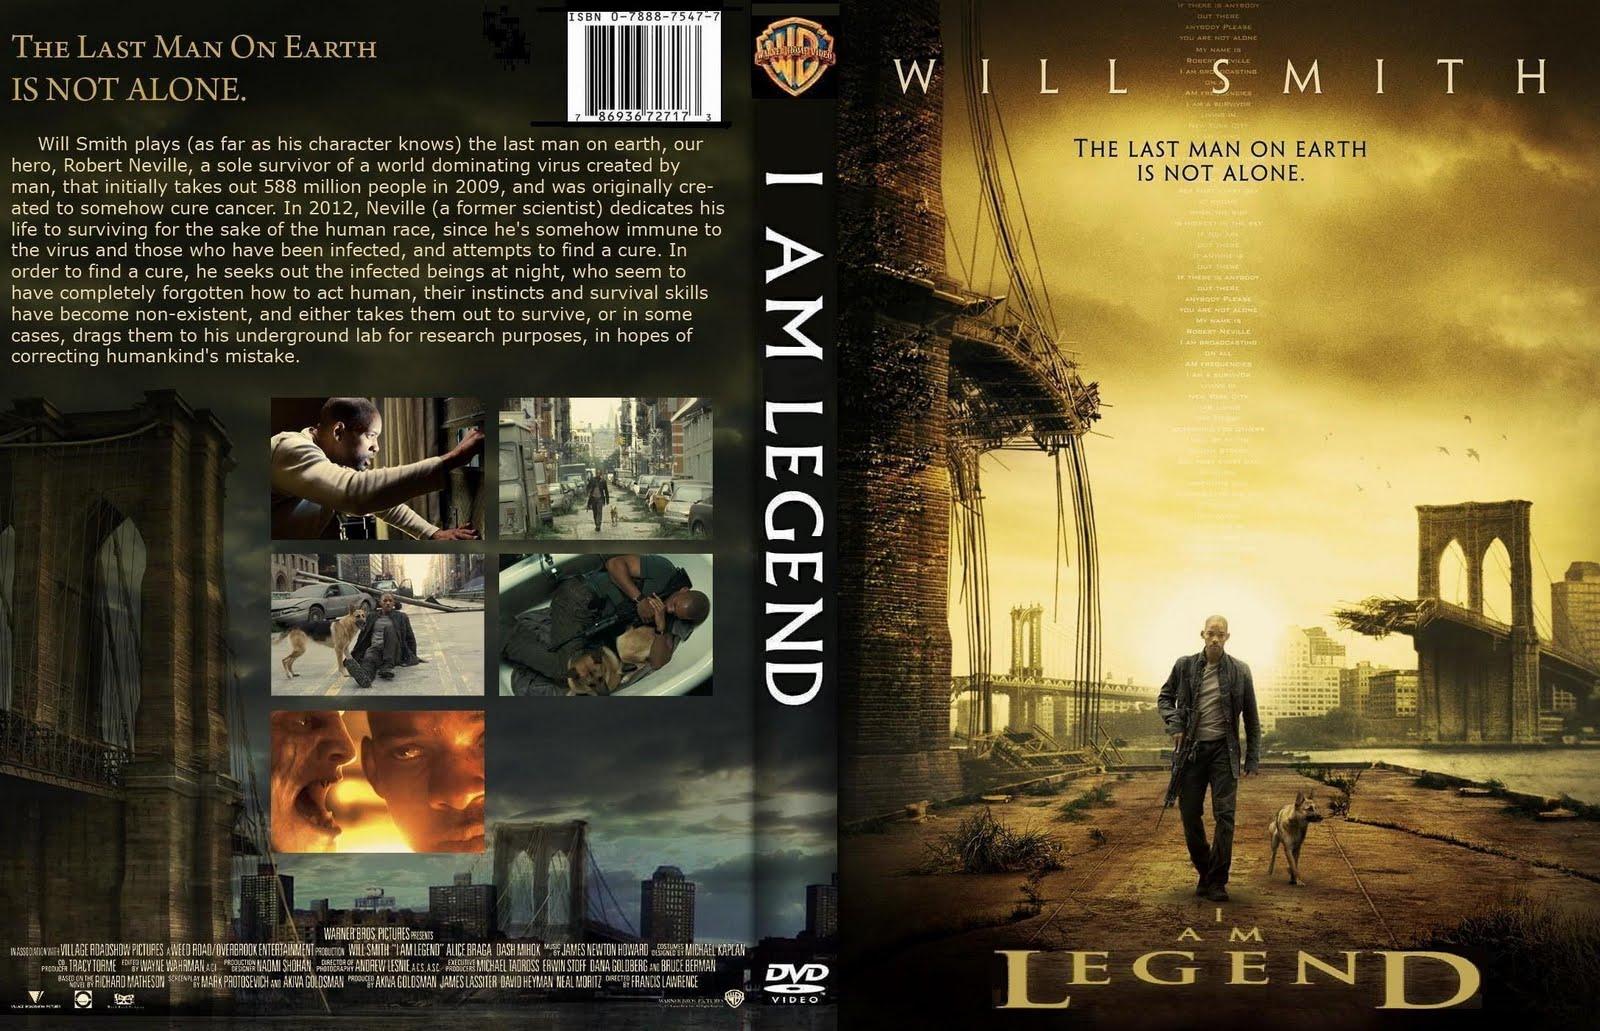 Am Legend 2 Release Date i am legend 2 release date